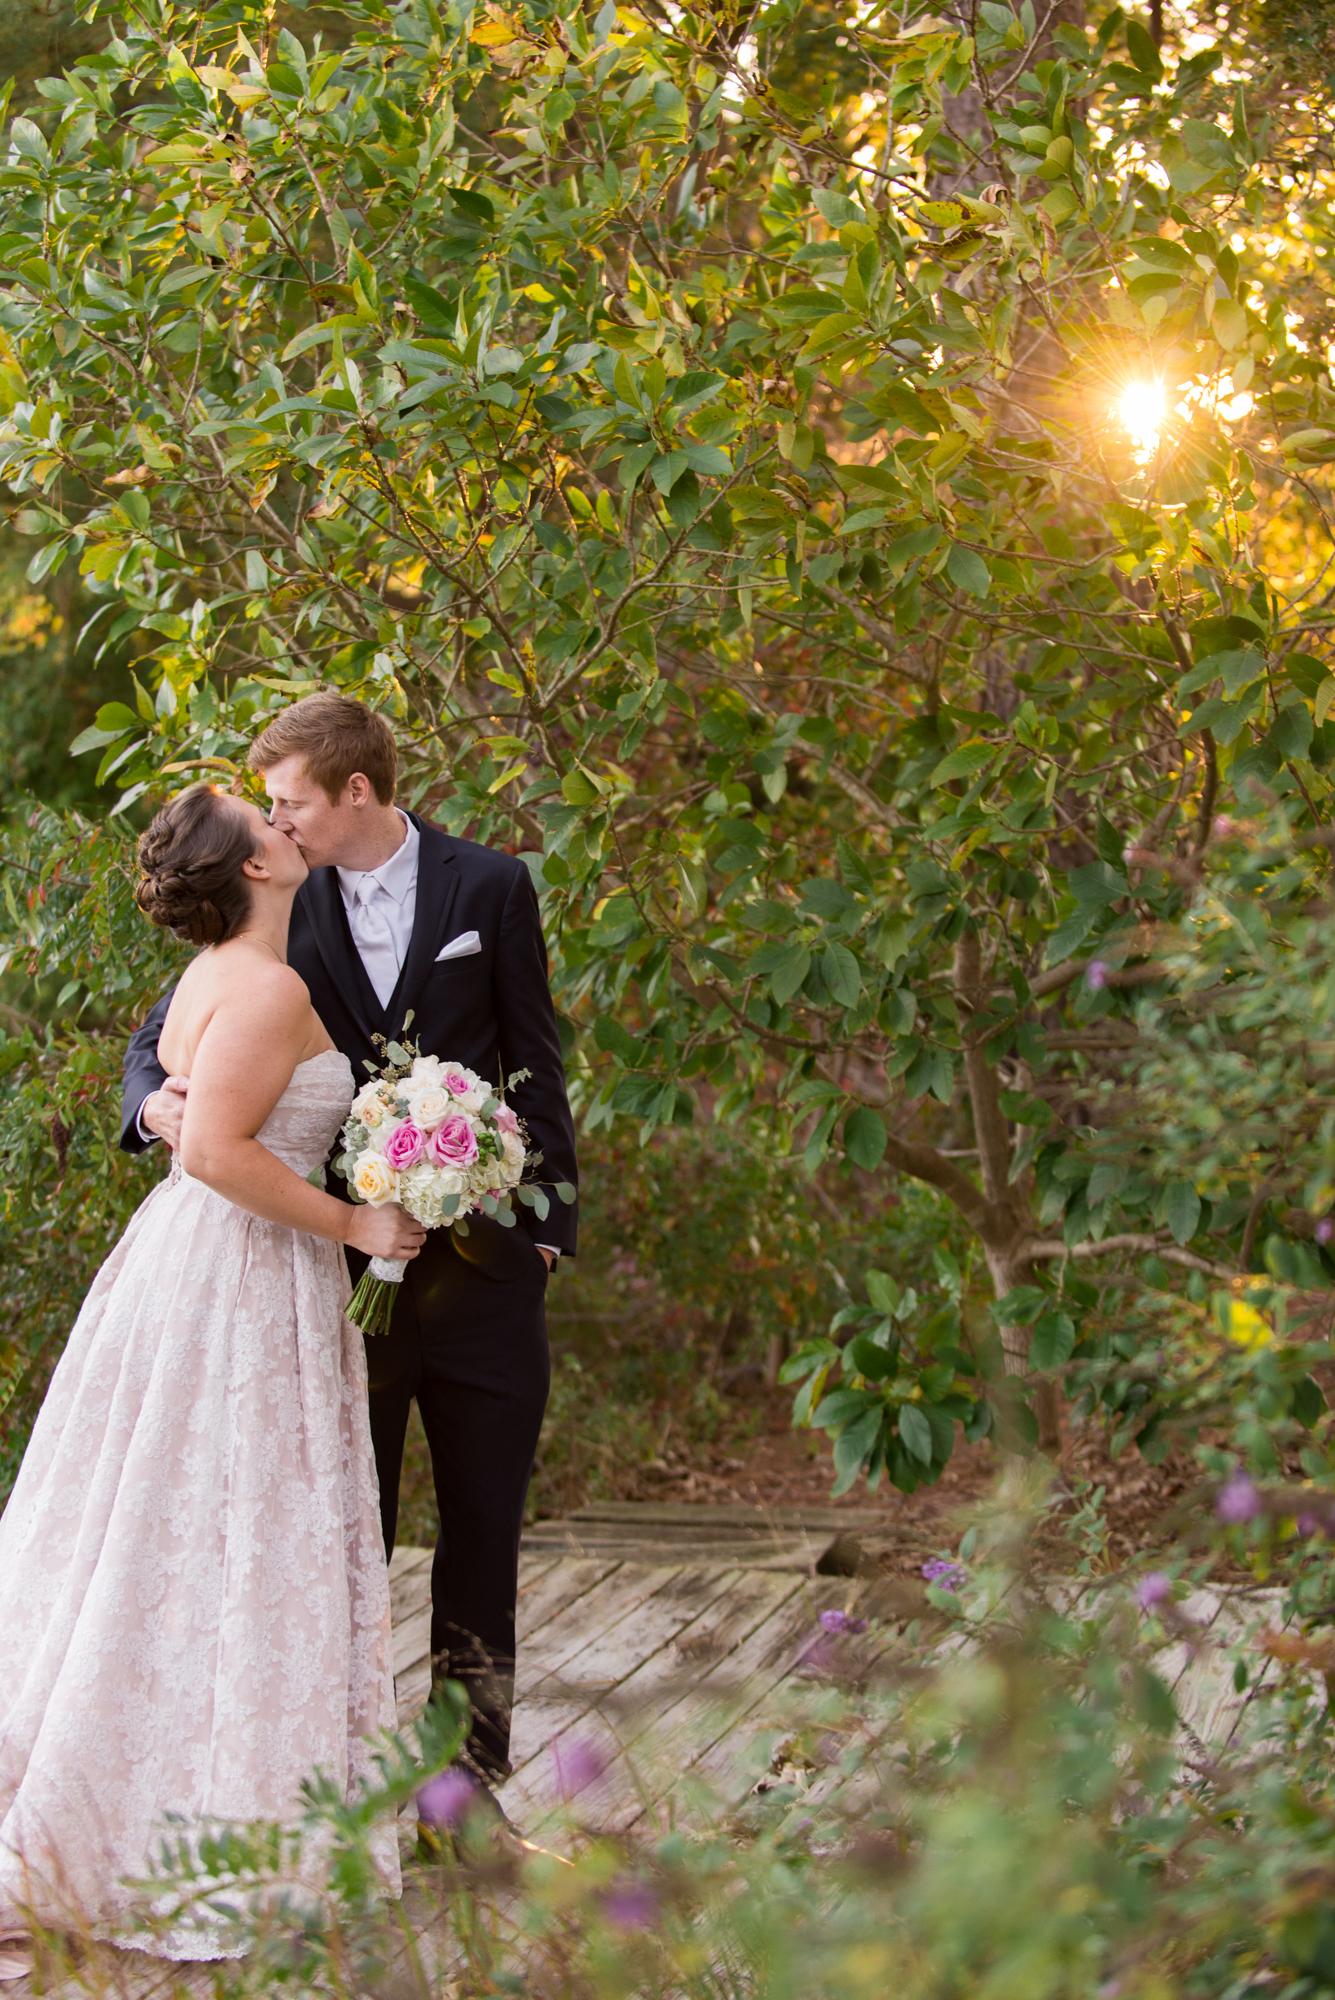 Norfolk Wedding Venue - Travel Themed Wedding - Caitlin Gerres Photography